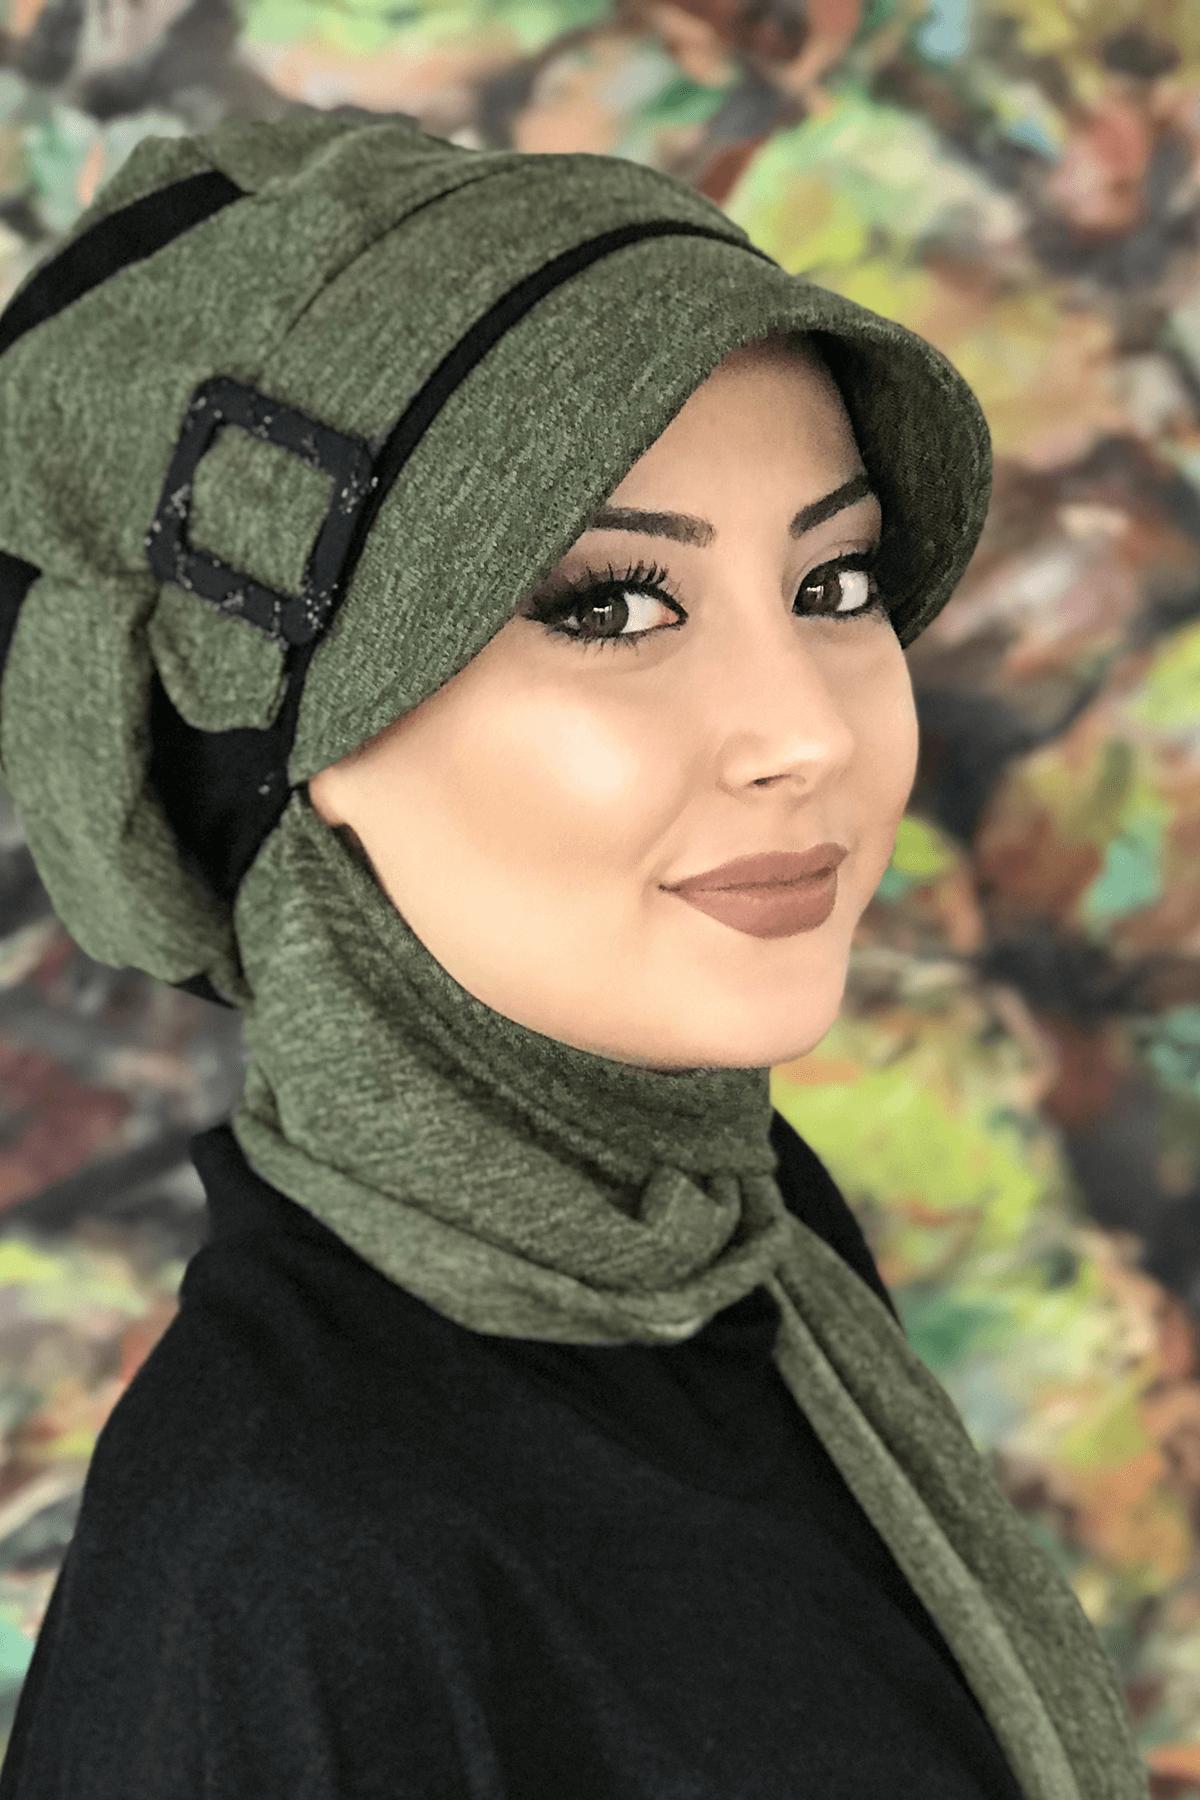 Yağ Yeşili Renkli Siyah Şerit Detaylı Tokalı Atkılı Şapka Şal